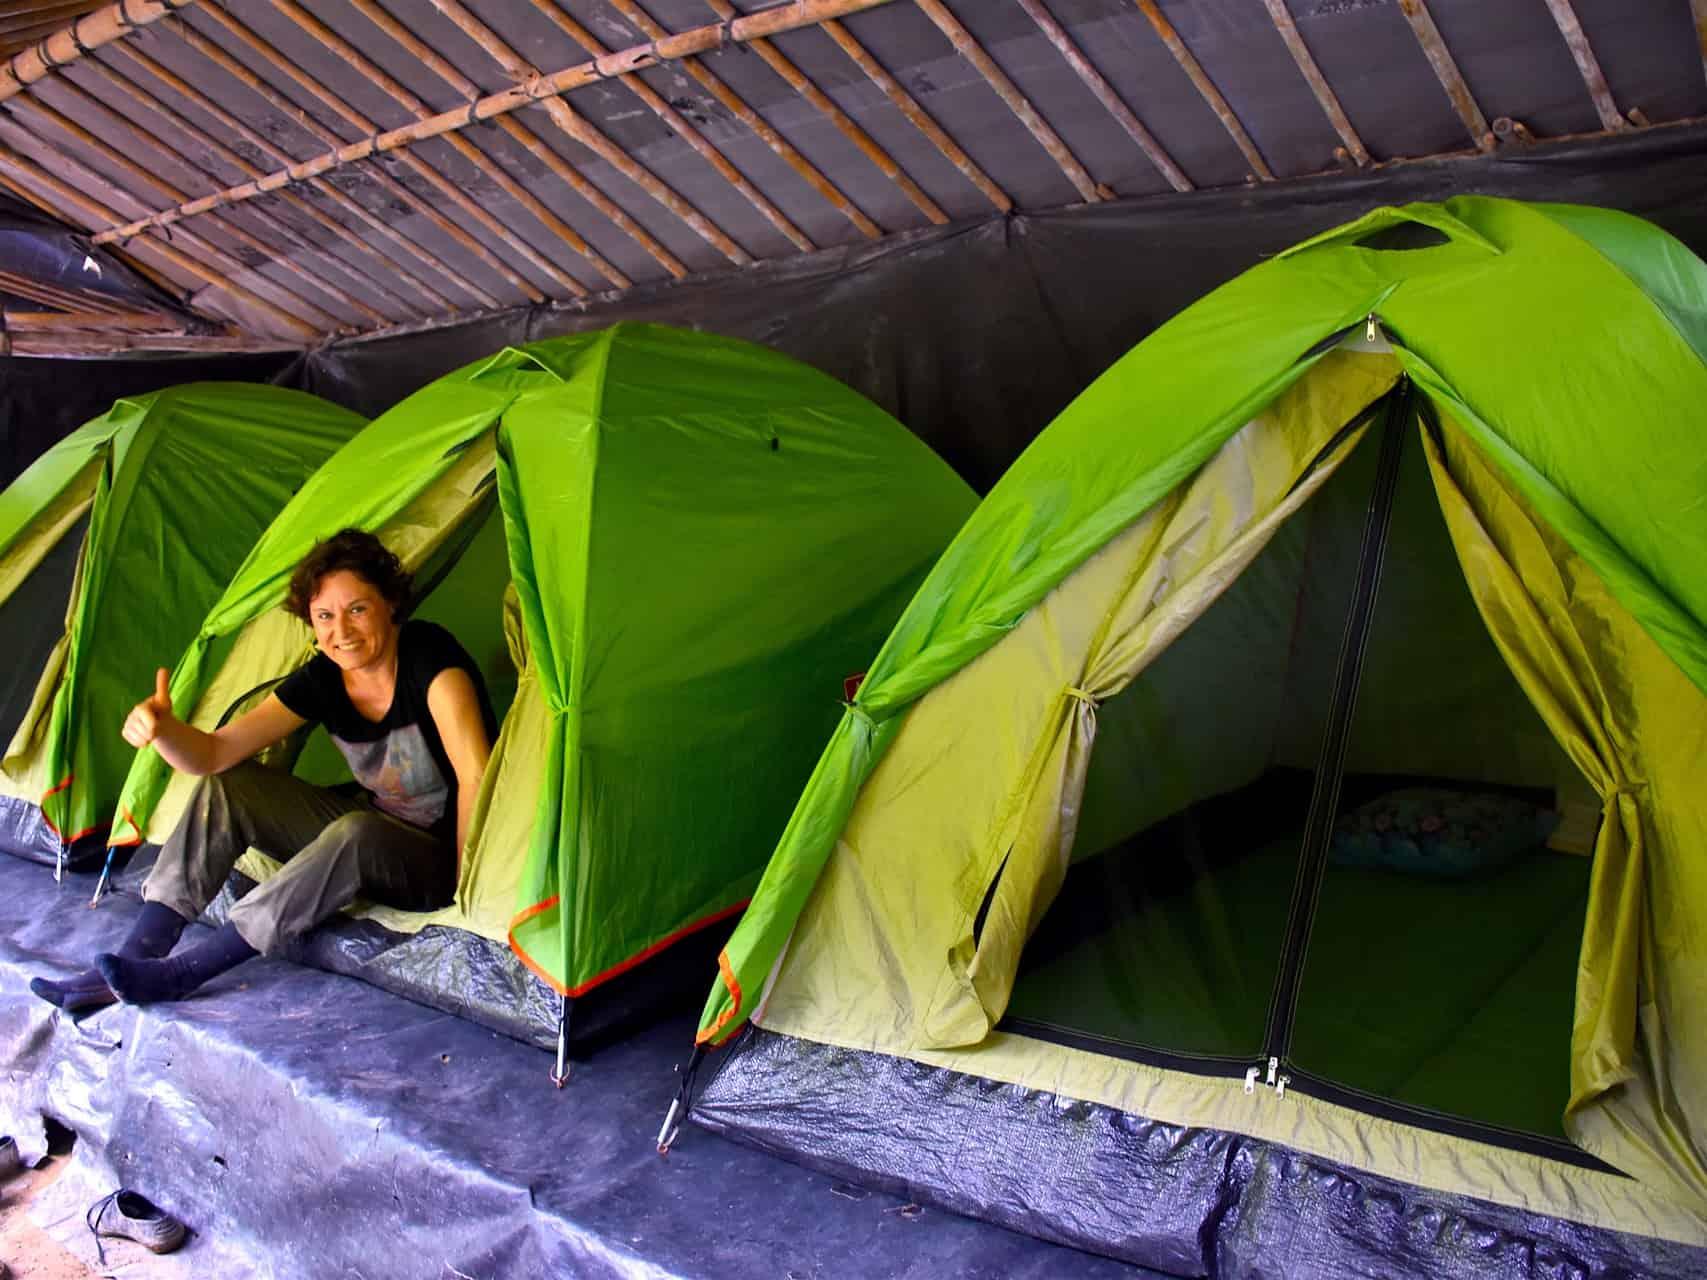 ECOTRAVEL'S JUNGLE CAMP - BUKIT LAWANG JUNGLE TREKKING BY SUMATRA ECOTRAVEL